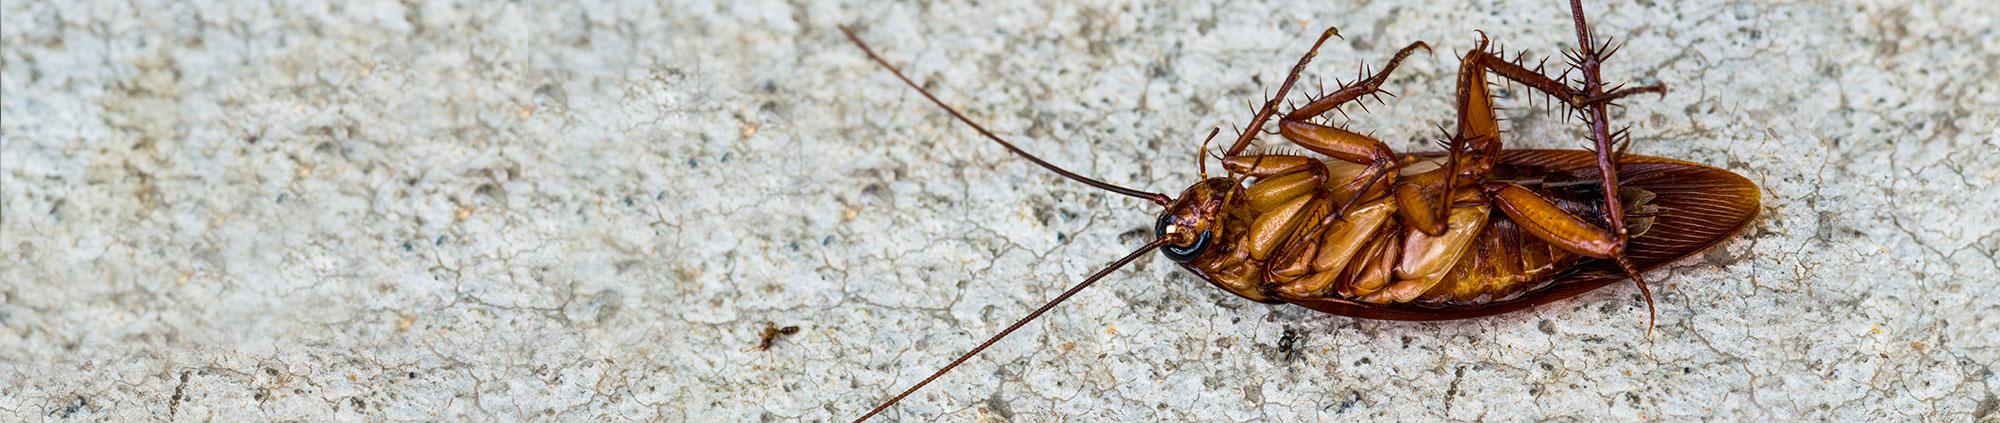 large-roach